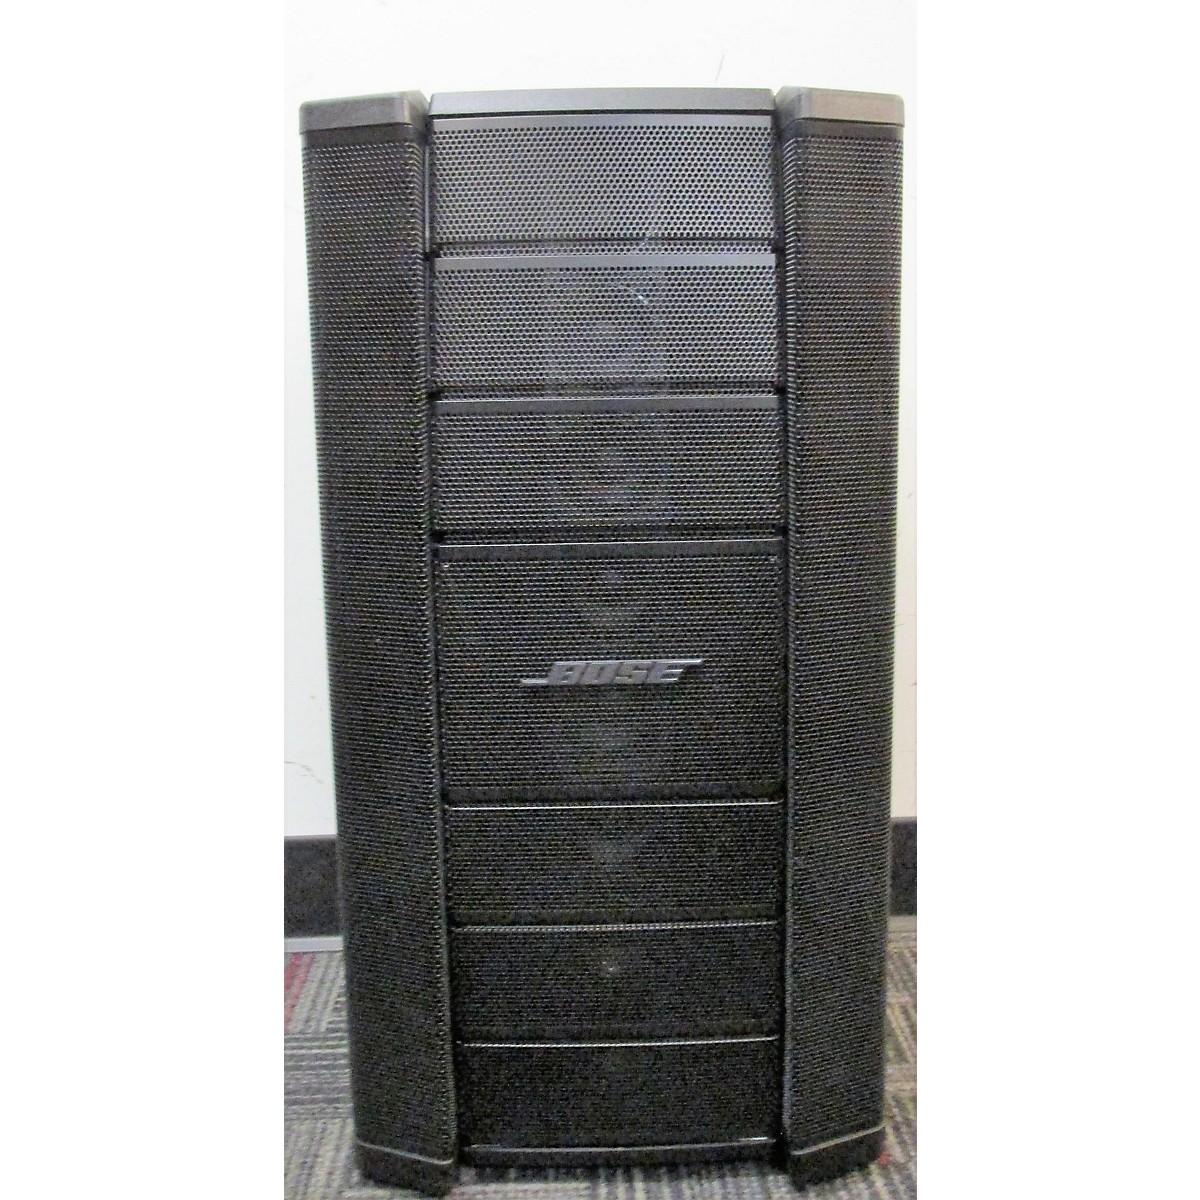 Bose F1 Model 812 Flexible Array Loudspeaker Powered Speaker